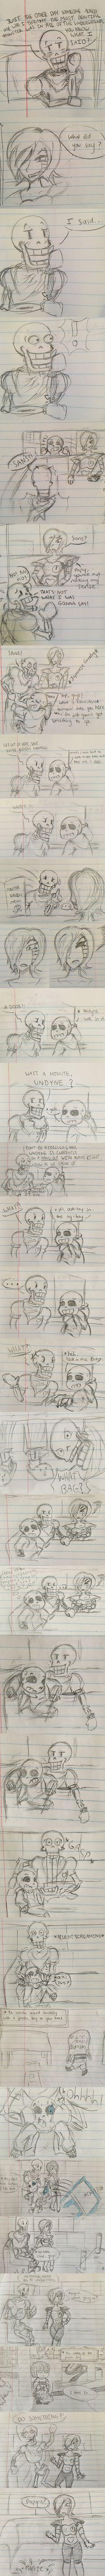 Undertale x Monsters Inc. comic by Aveanna Tomada